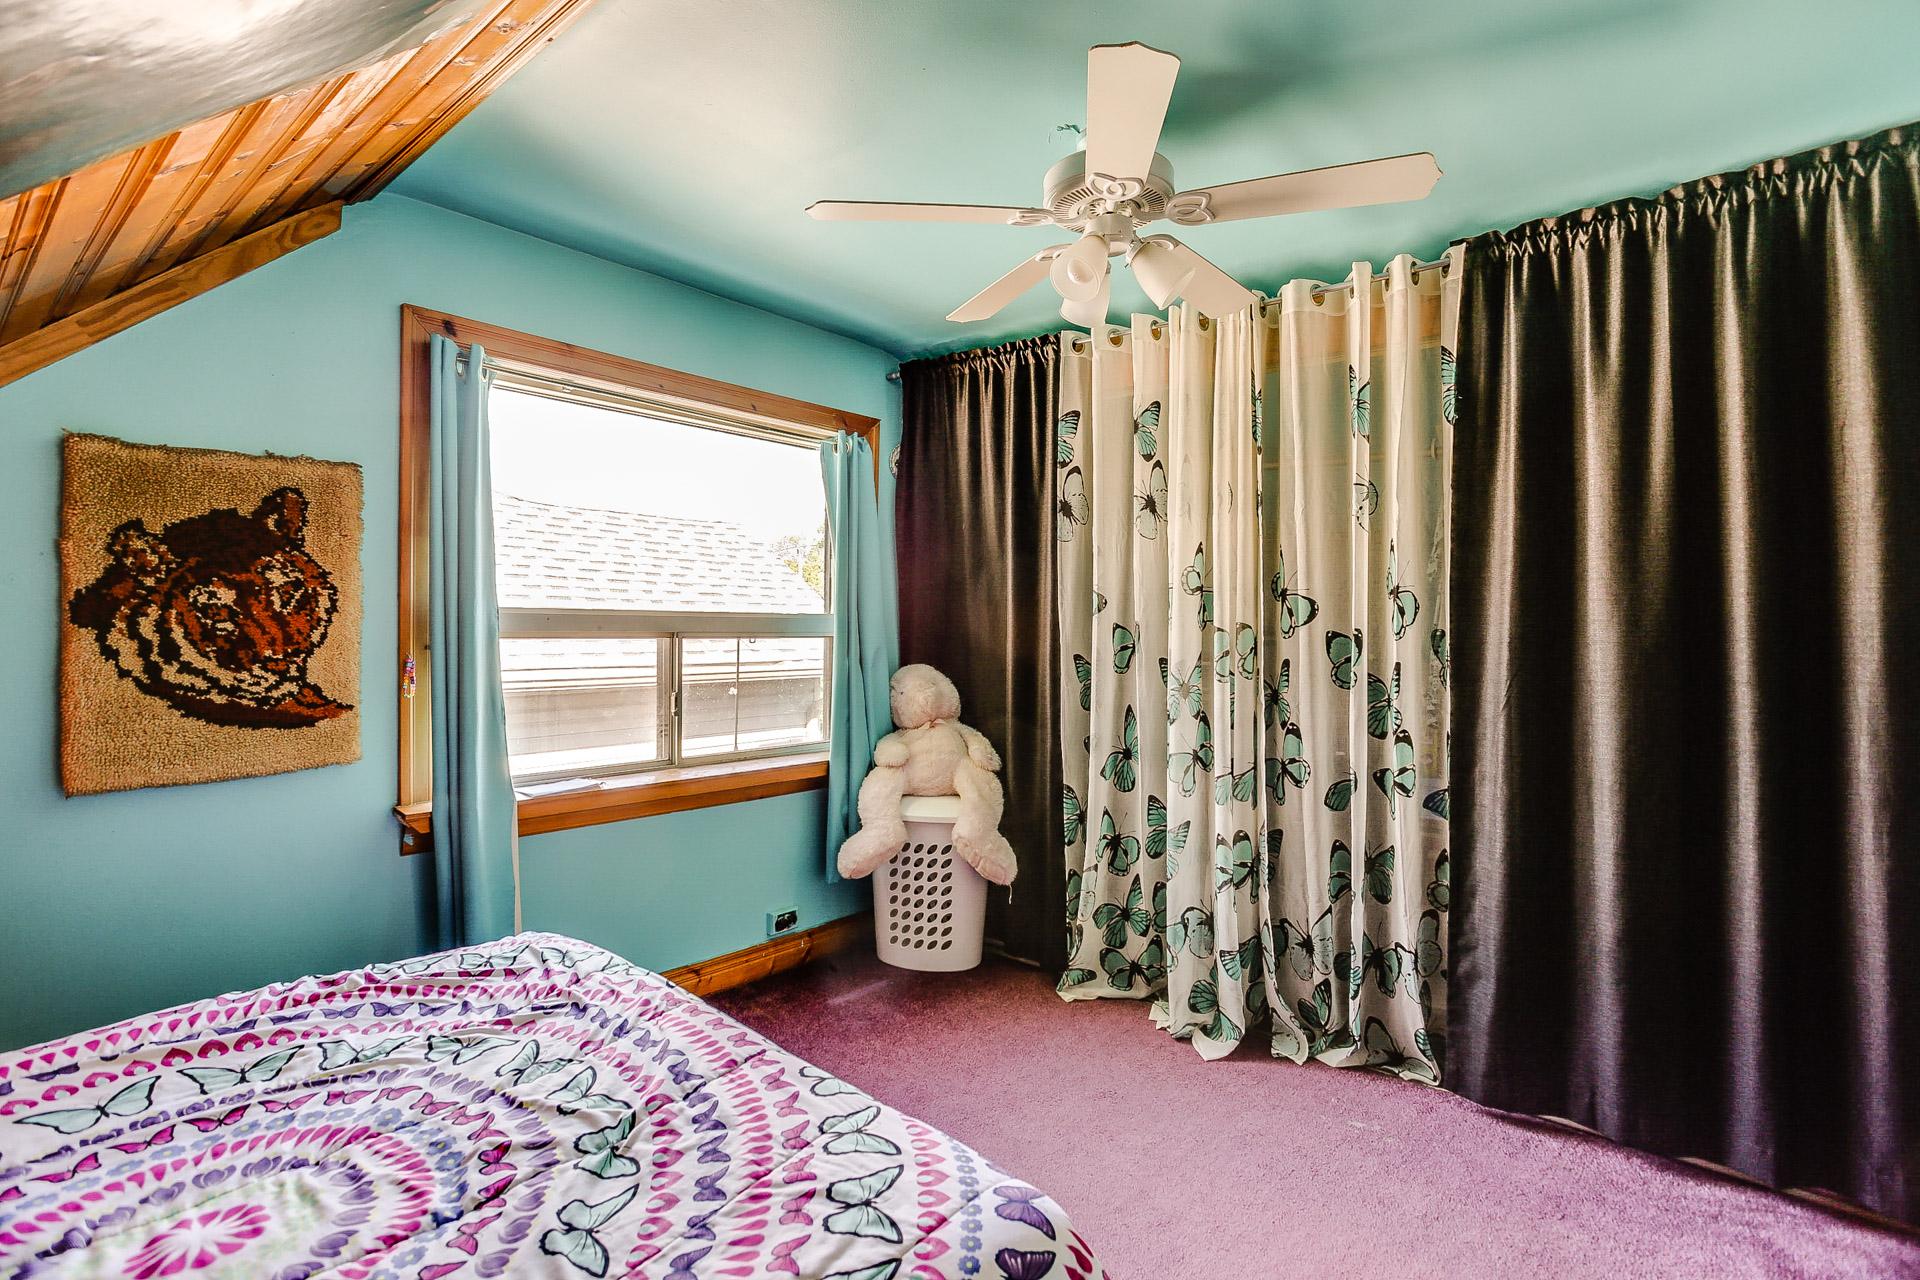 23_third_bedroom1.jpg